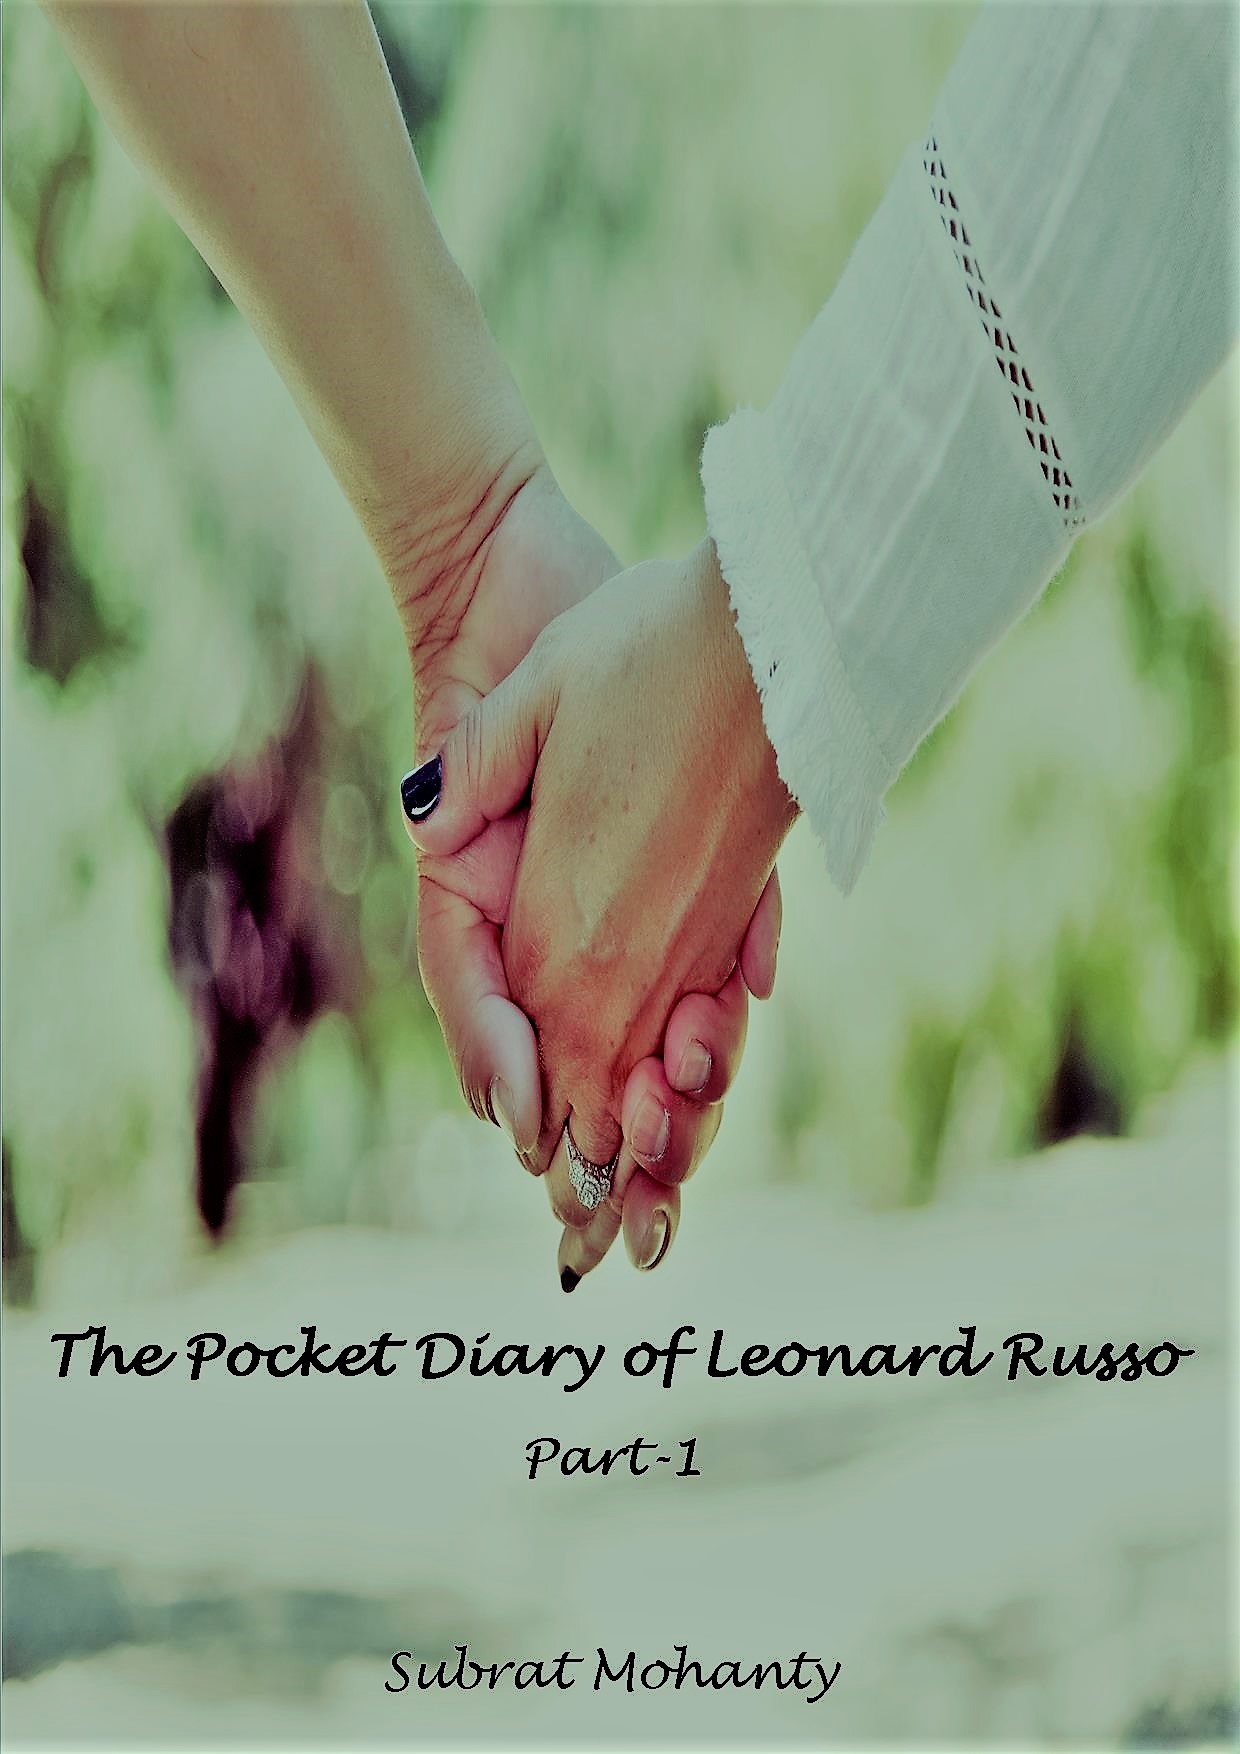 The pocket diary of leonard russo